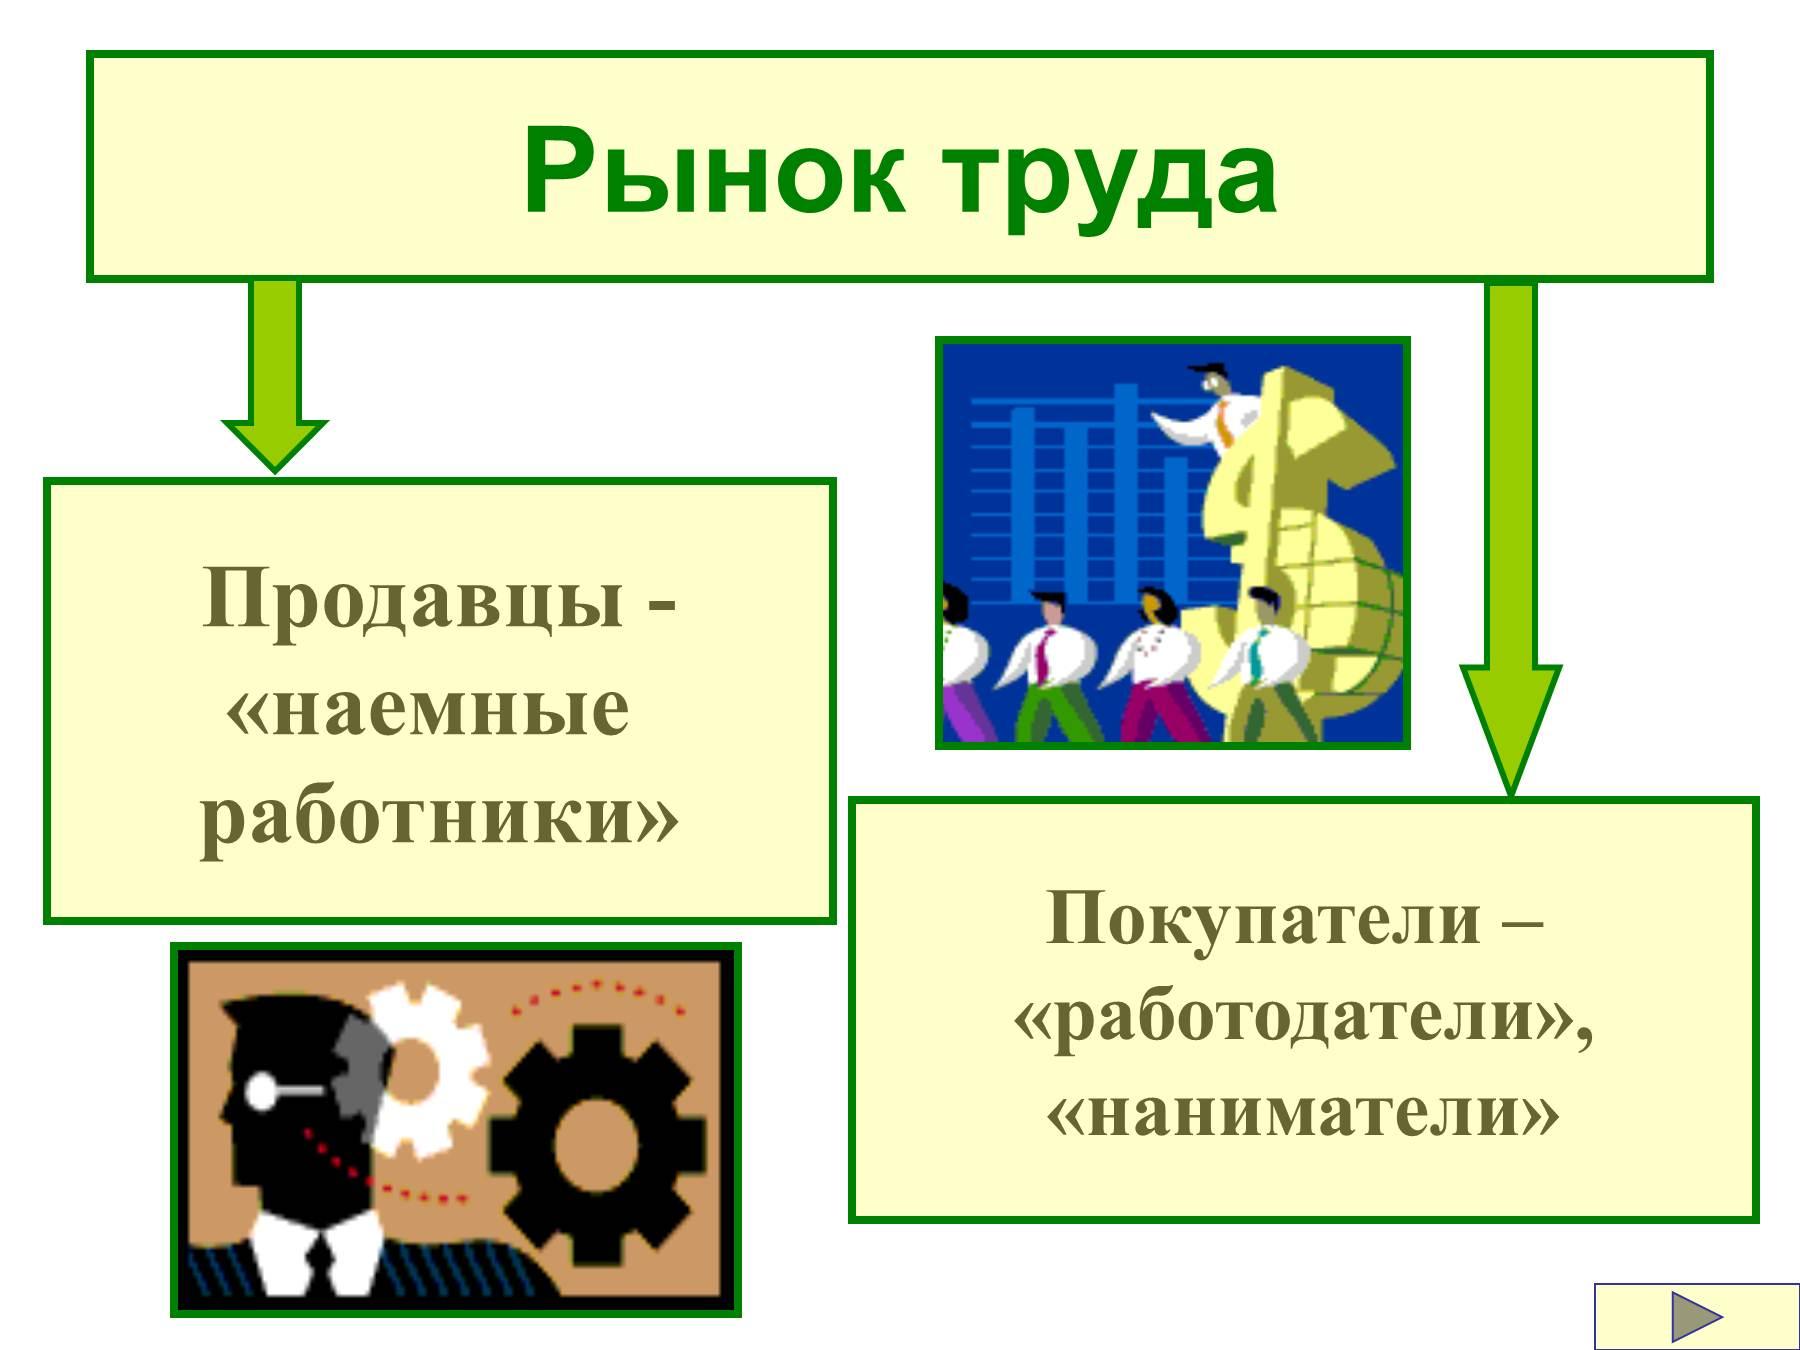 Экономика труда в схемах